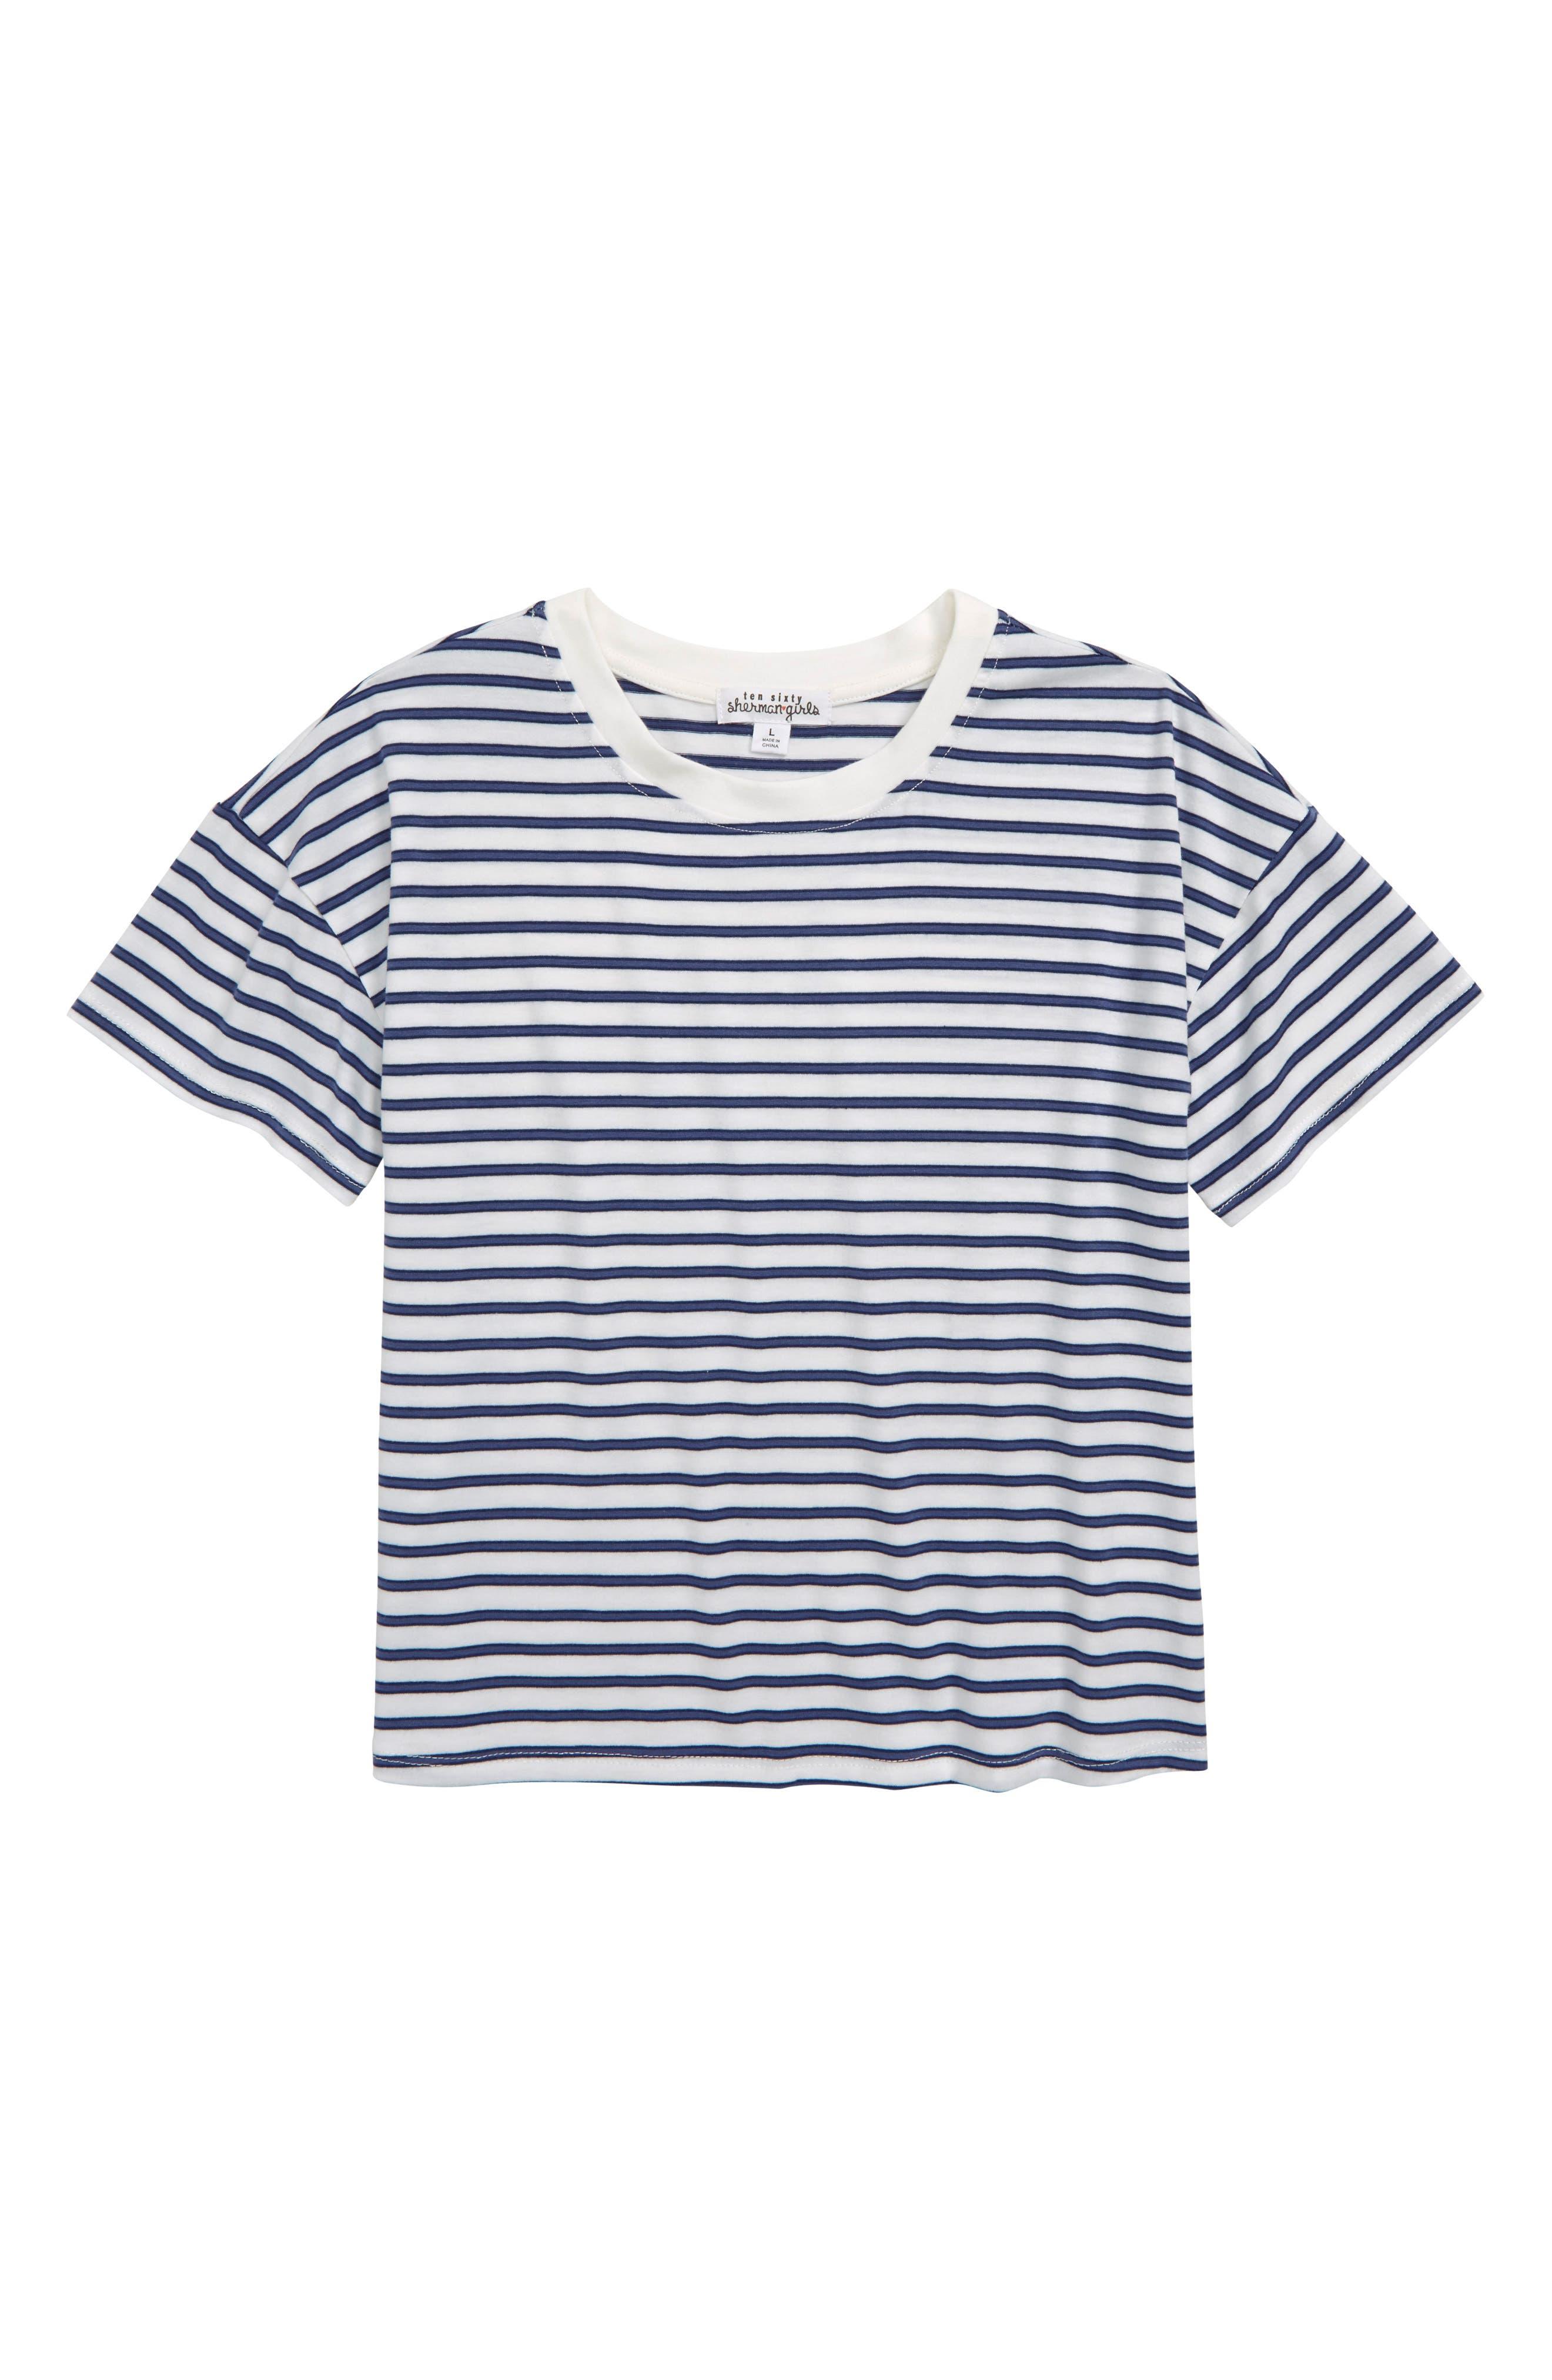 TEN SIXTY SHERMAN Stripe Tee, Main, color, IVORY/ VINTAGE BLUE